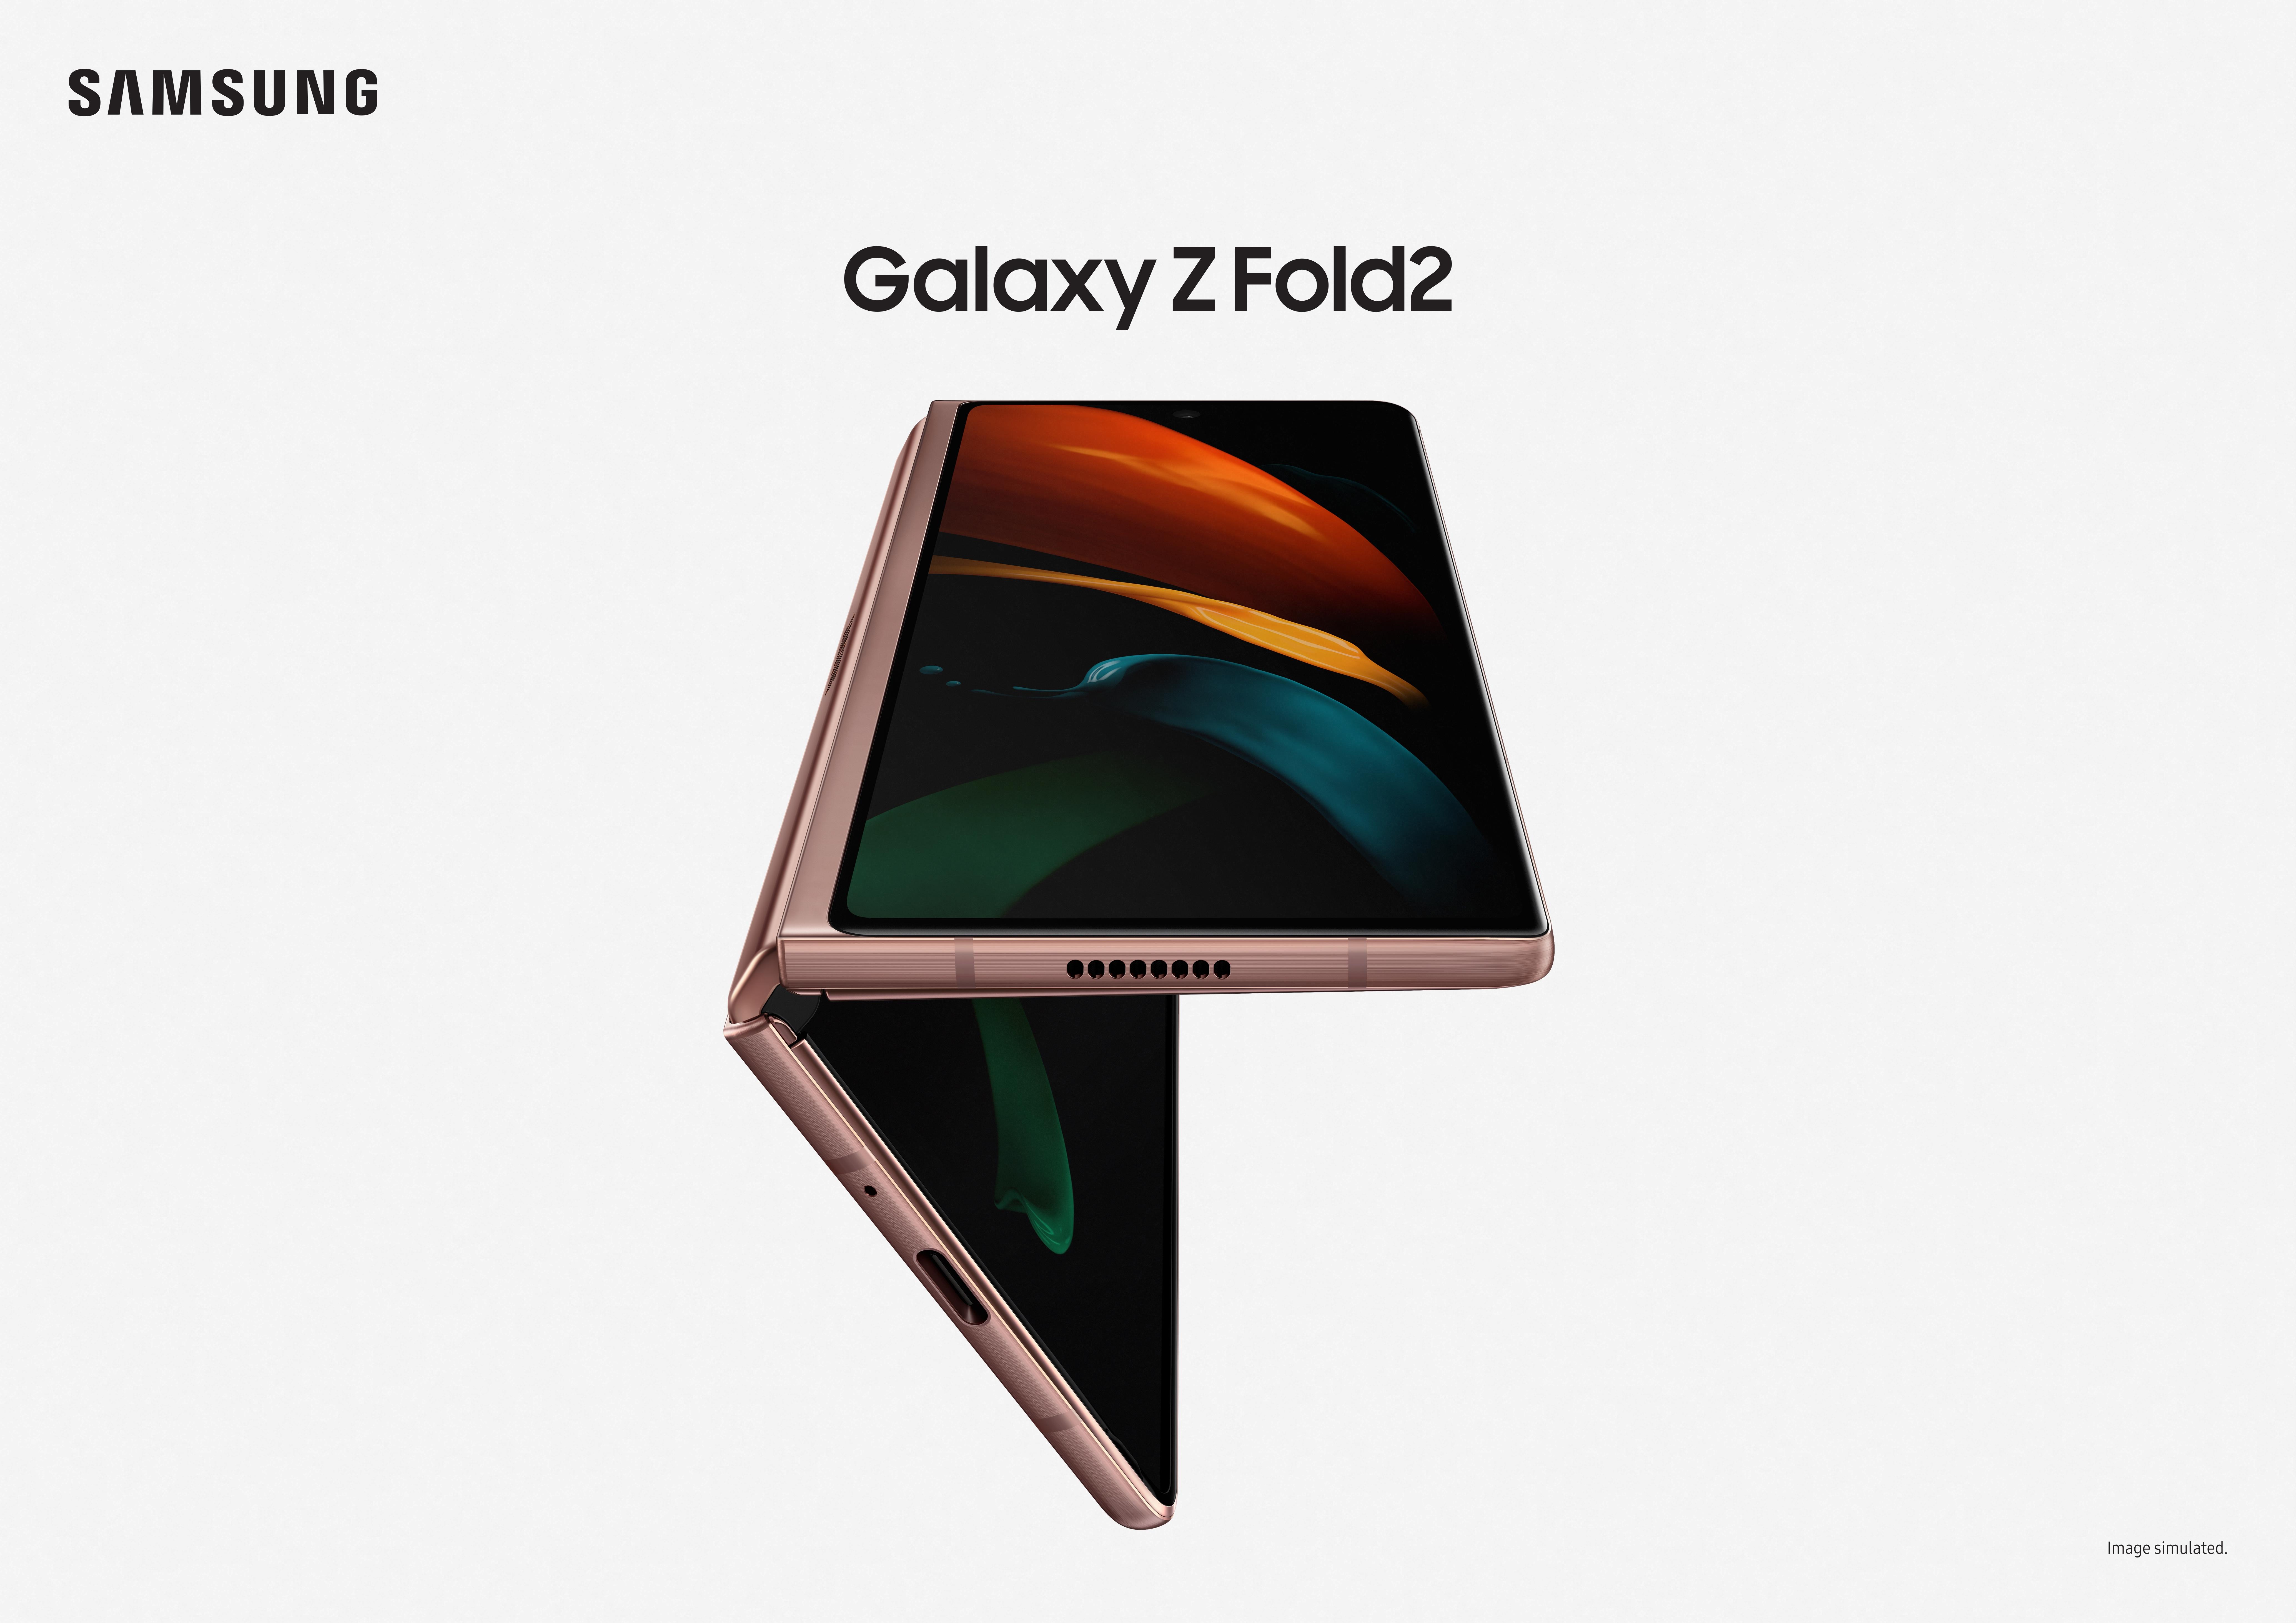 Samsung Announces Galaxy Z Fold 2 Second Generation Foldable